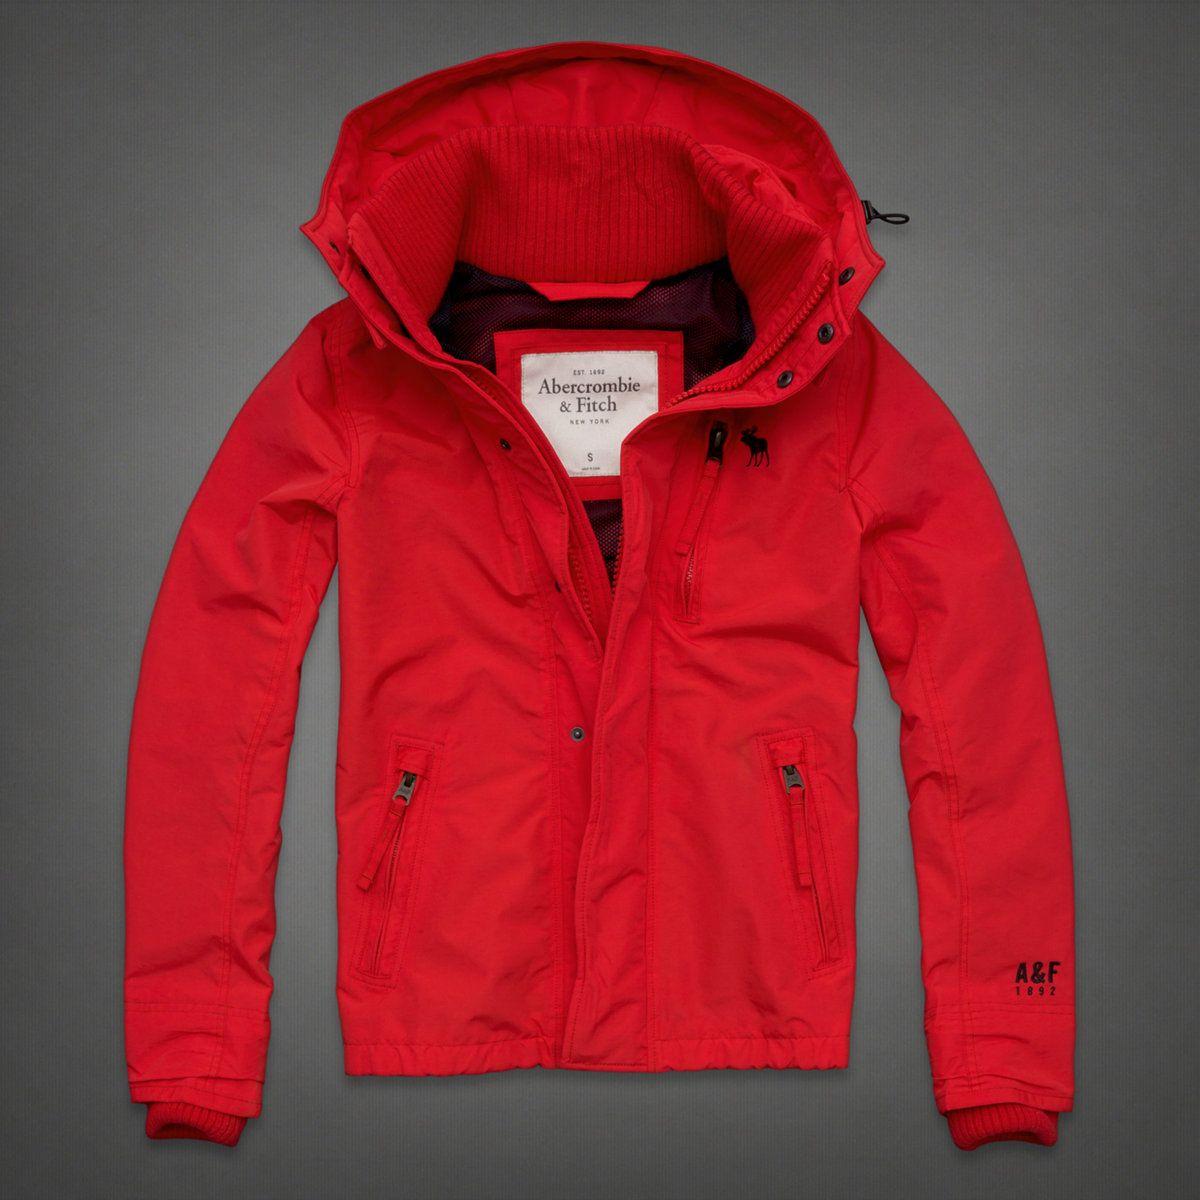 140 Mens A All Season Weather Warrior Jacket Mens Outerwear Abercrombie Com Men S Coats Jackets Jackets Warriors Jacket [ 1200 x 1200 Pixel ]